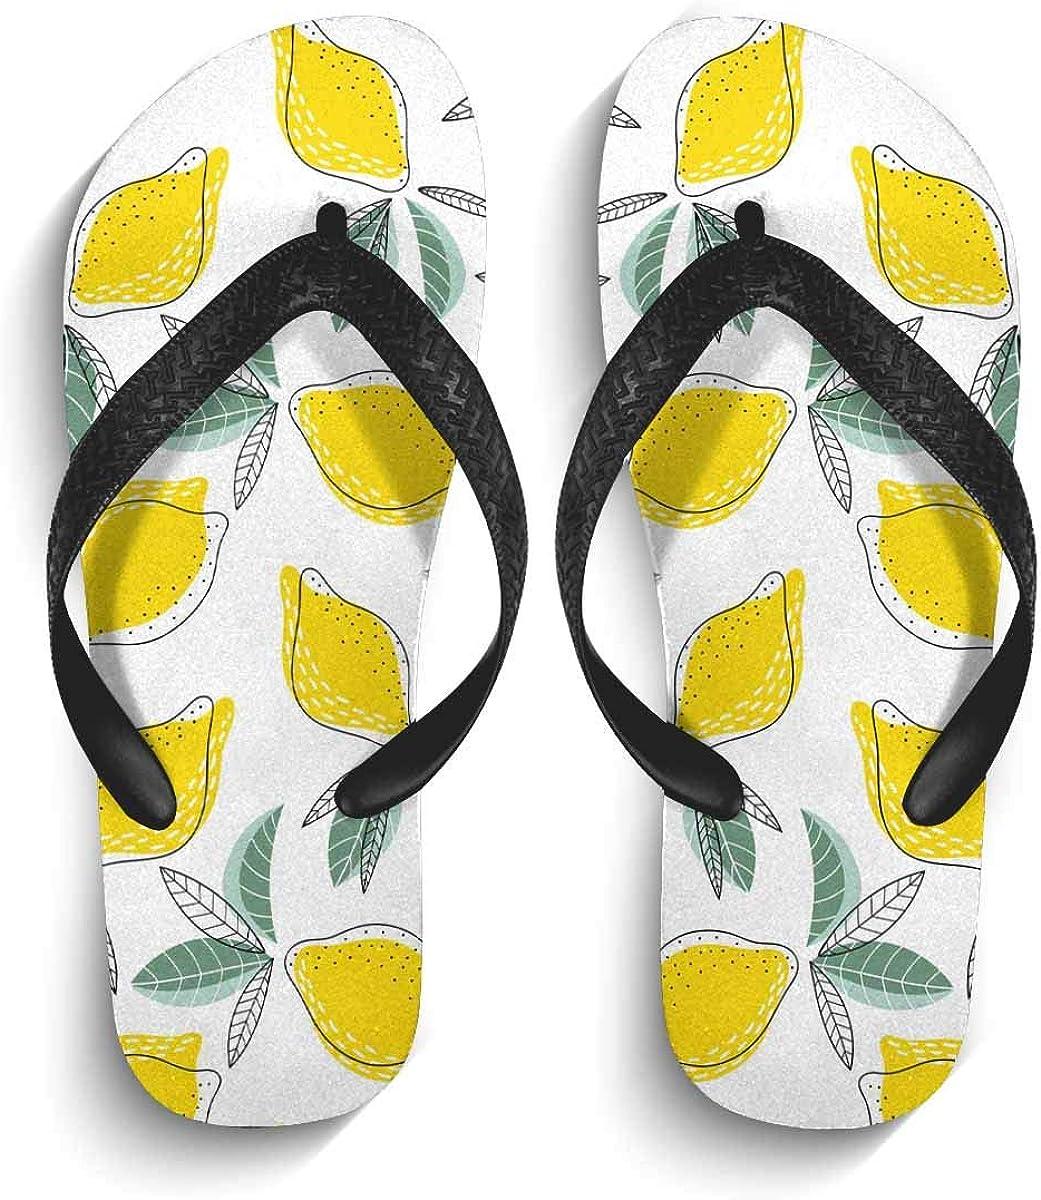 InterestPrint Men's Non-Slip Flip Flops Sandal Bright and Juicy with Lemons Summer Beach Thong Slippers S